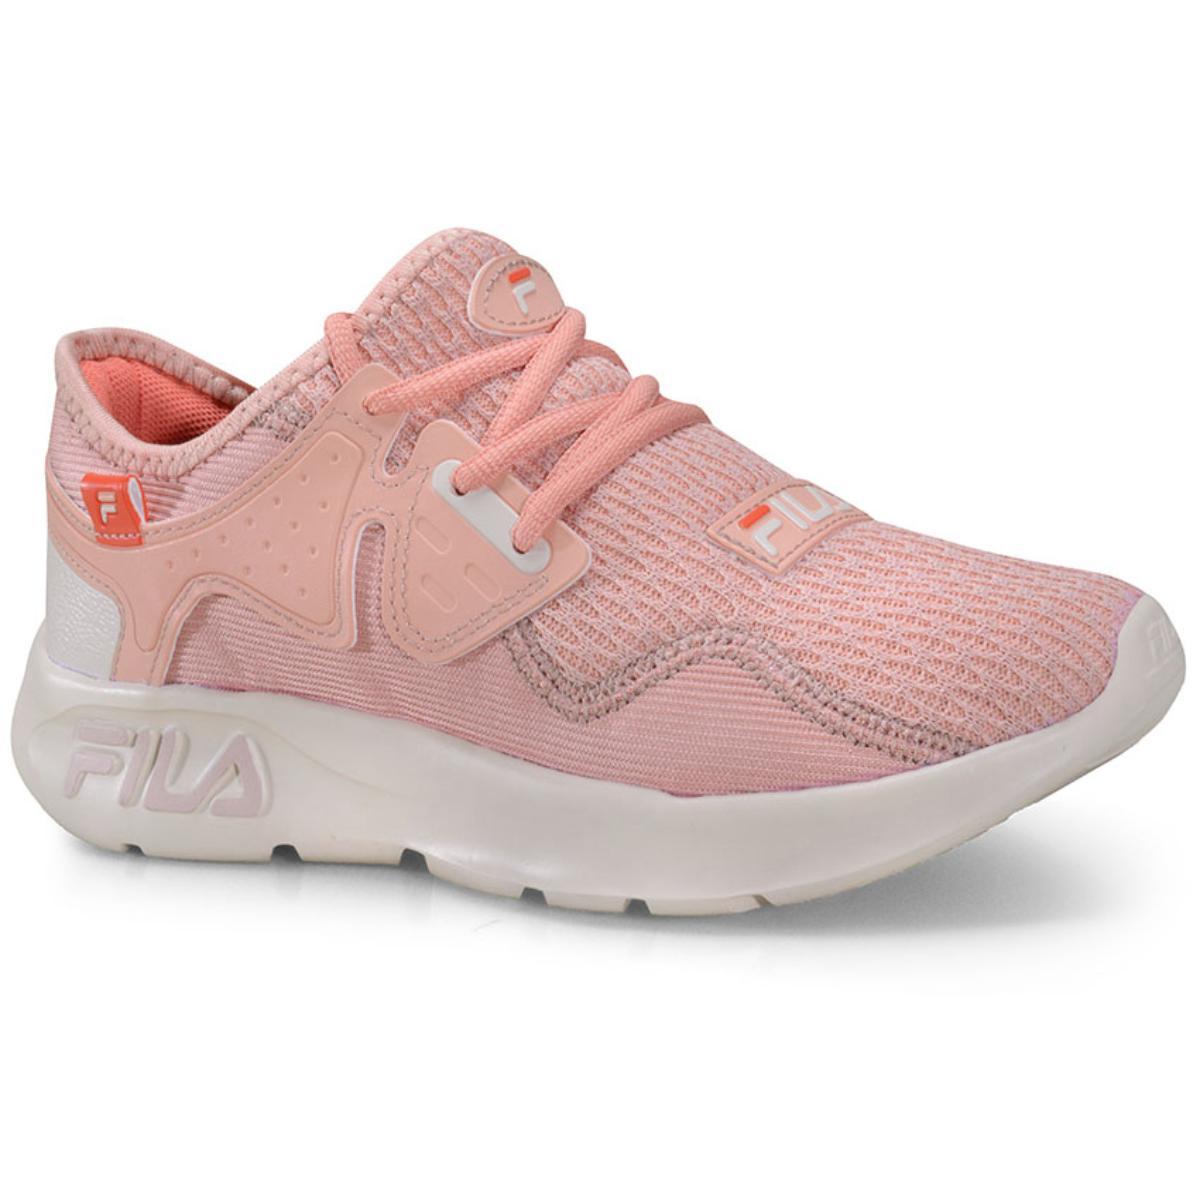 Tênis Feminino Fila F02st004028.4547 Iconic 4547 Coral